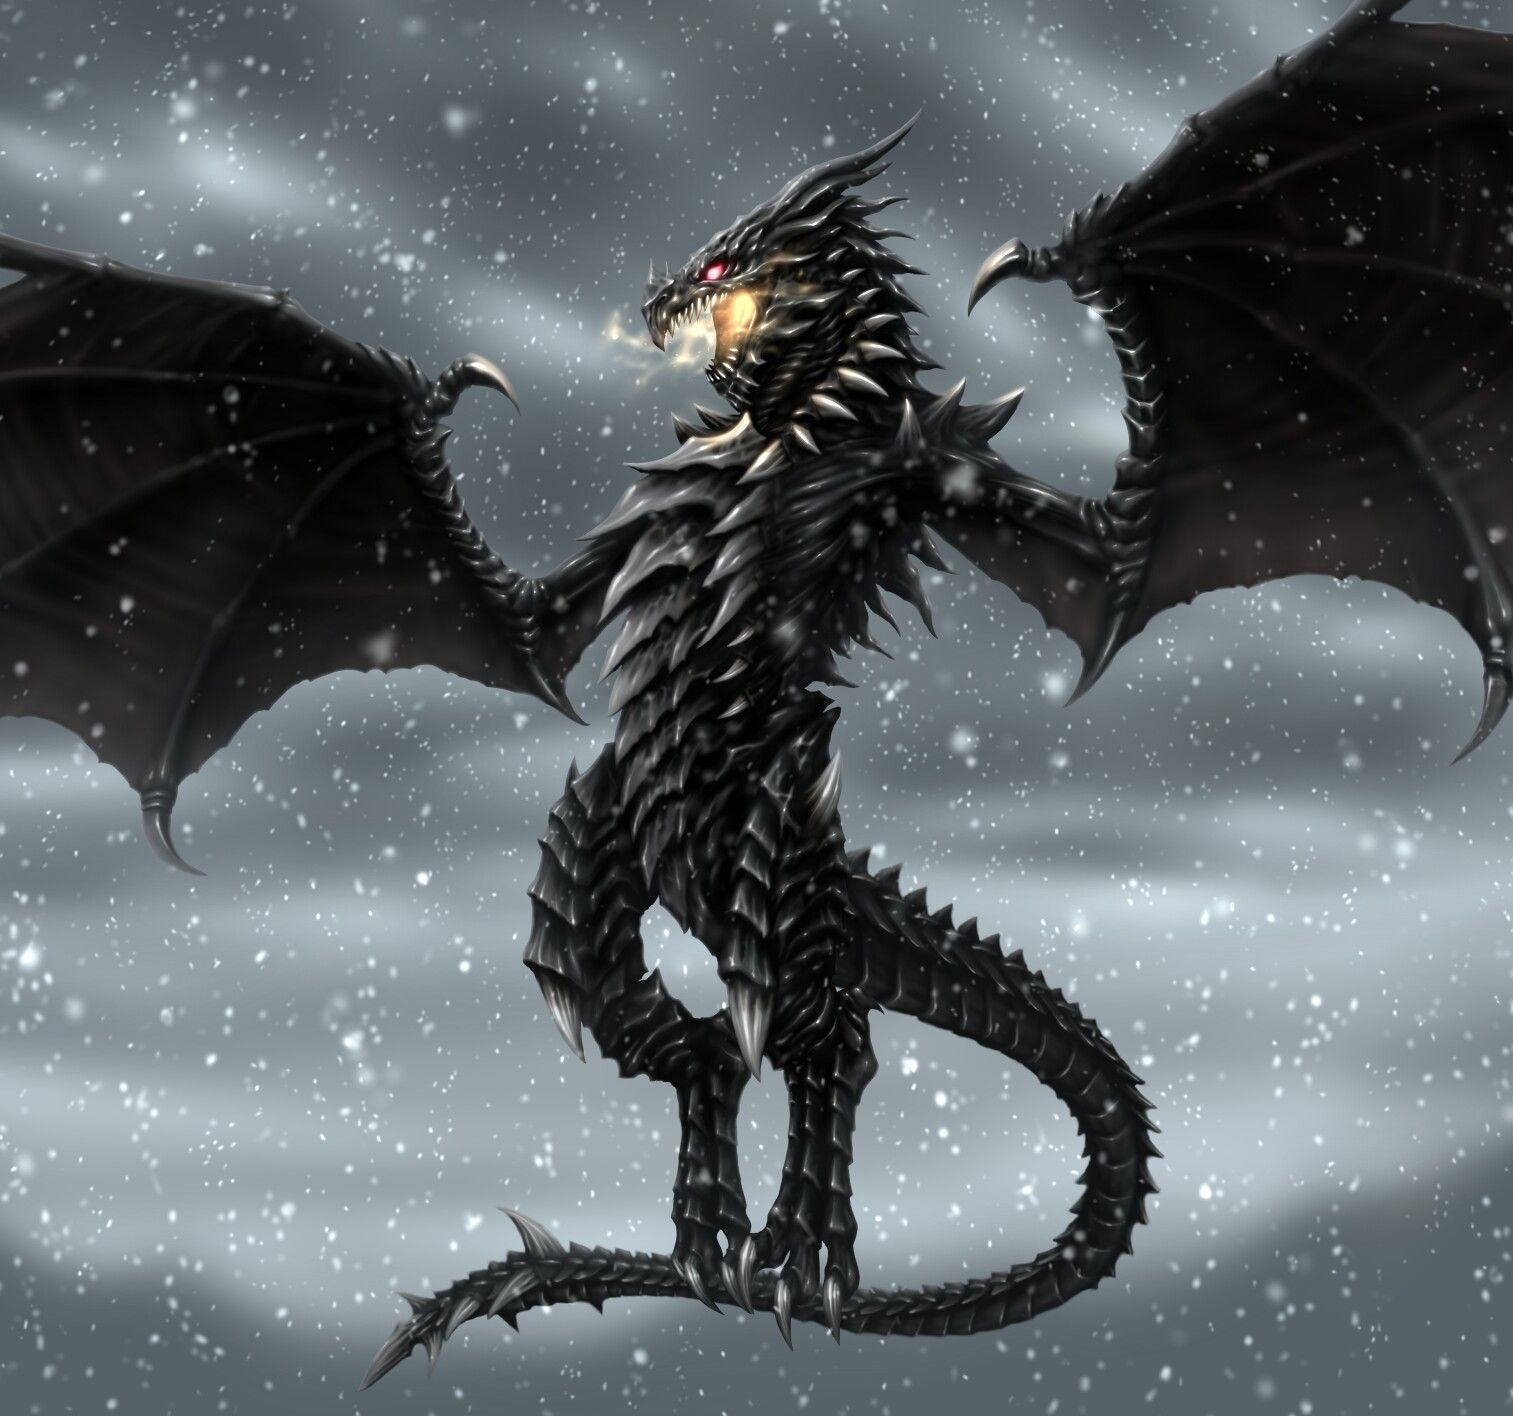 Skyrim Alduin Skyrim Art Skyrim Dragon Dragon Pictures